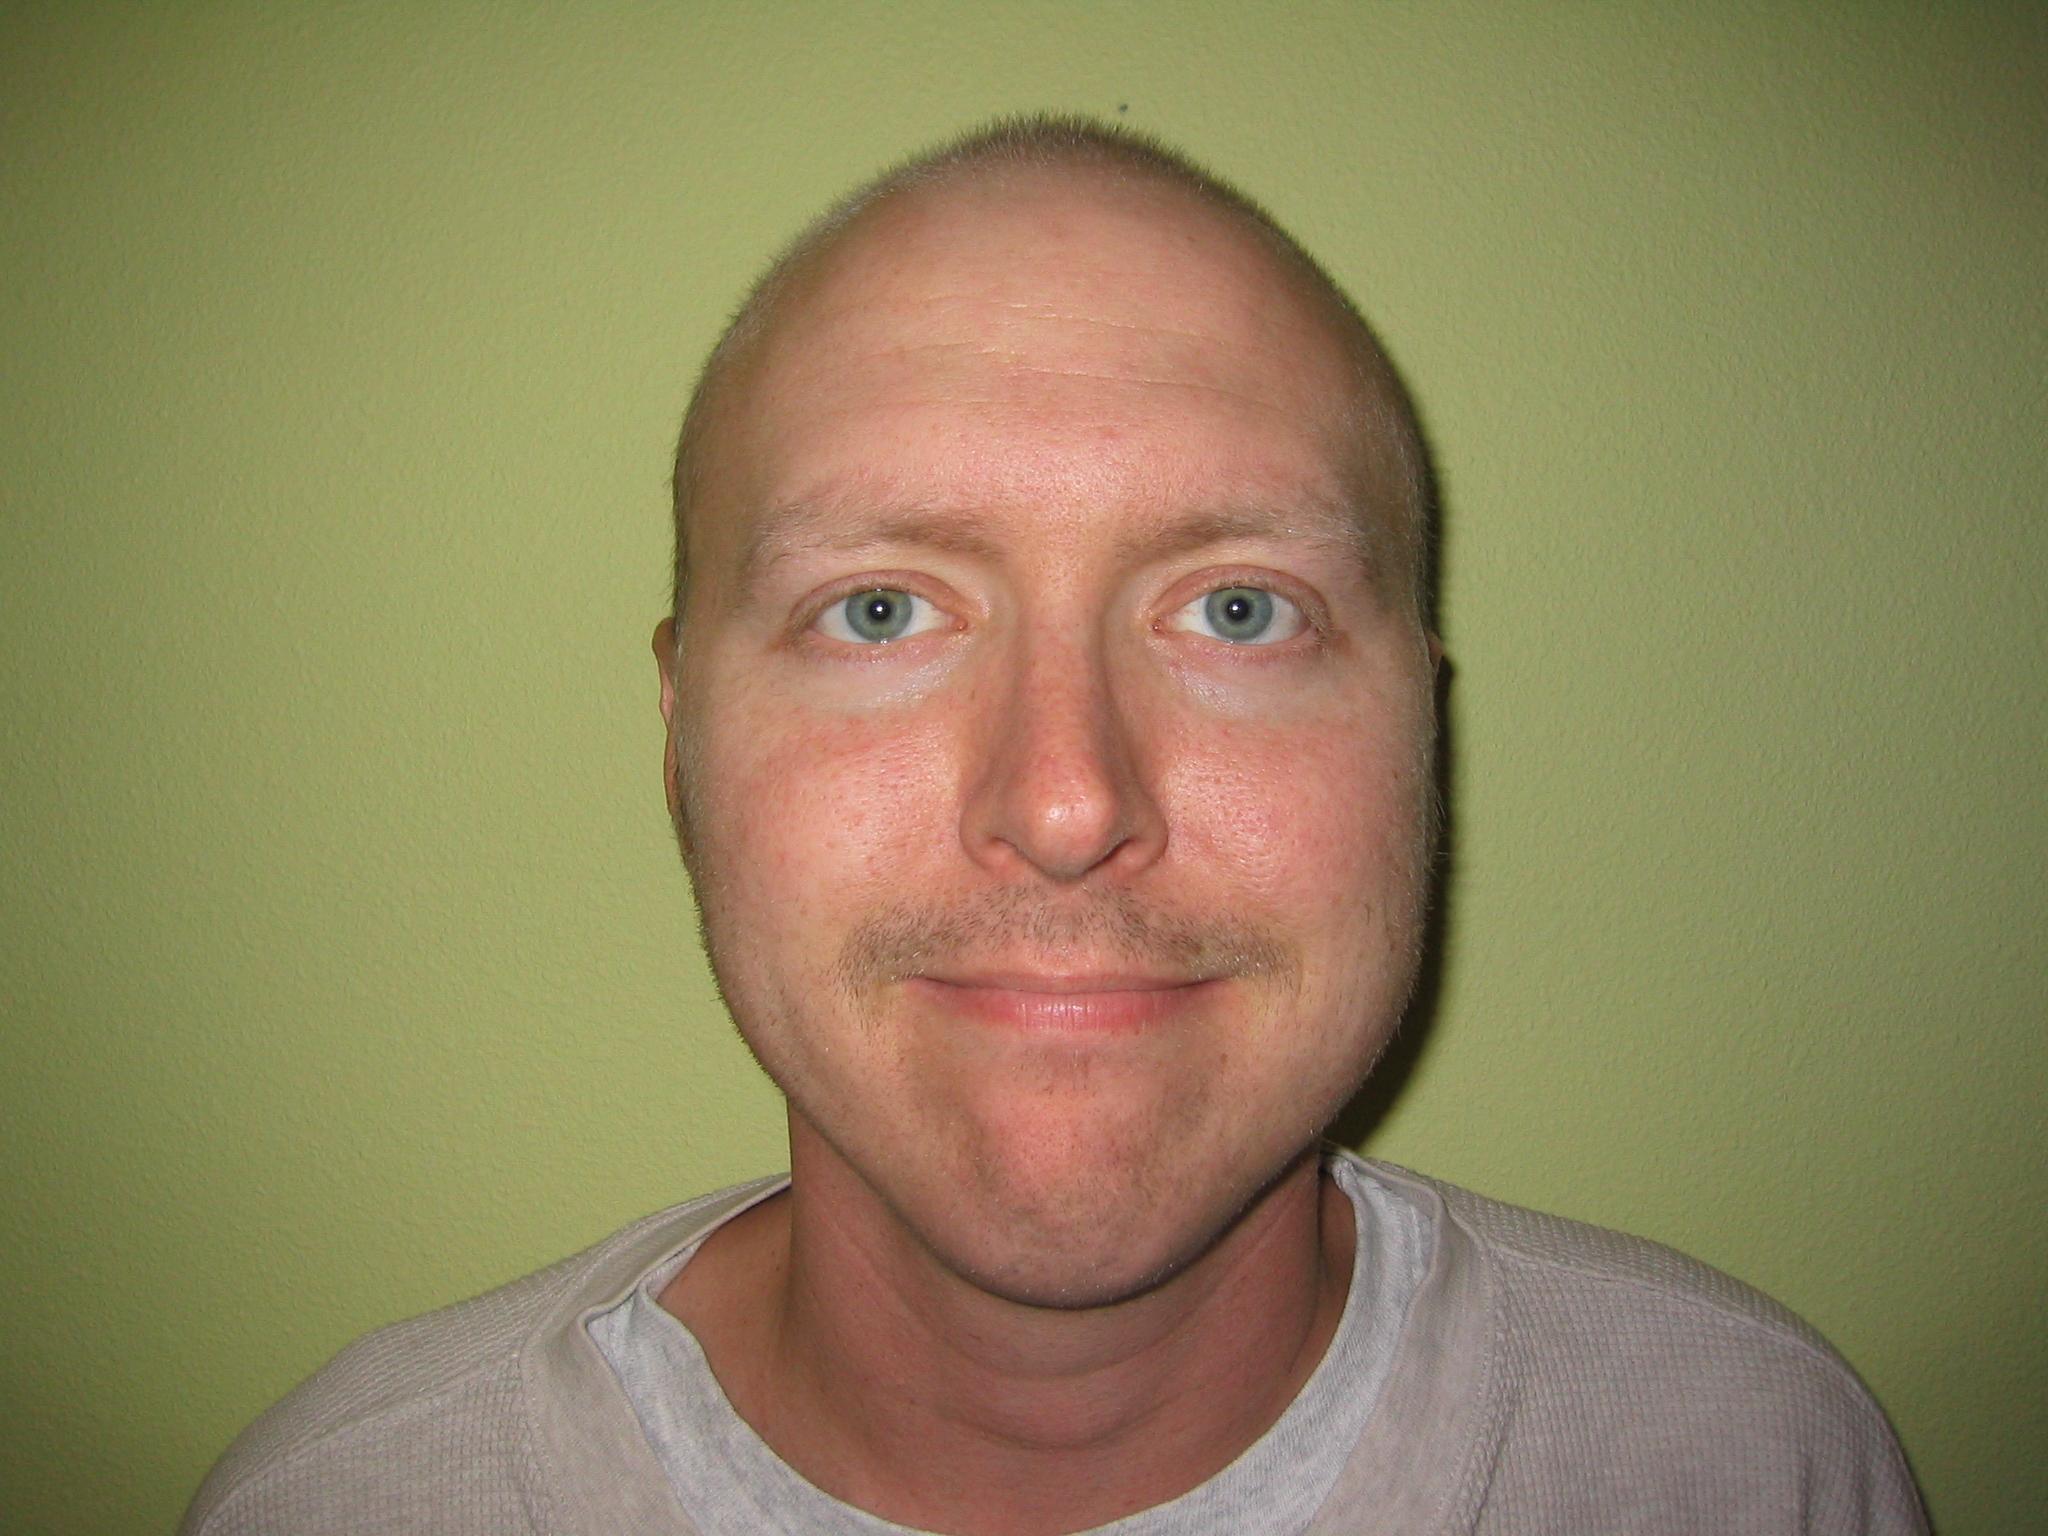 Choppy haircut medium length teen